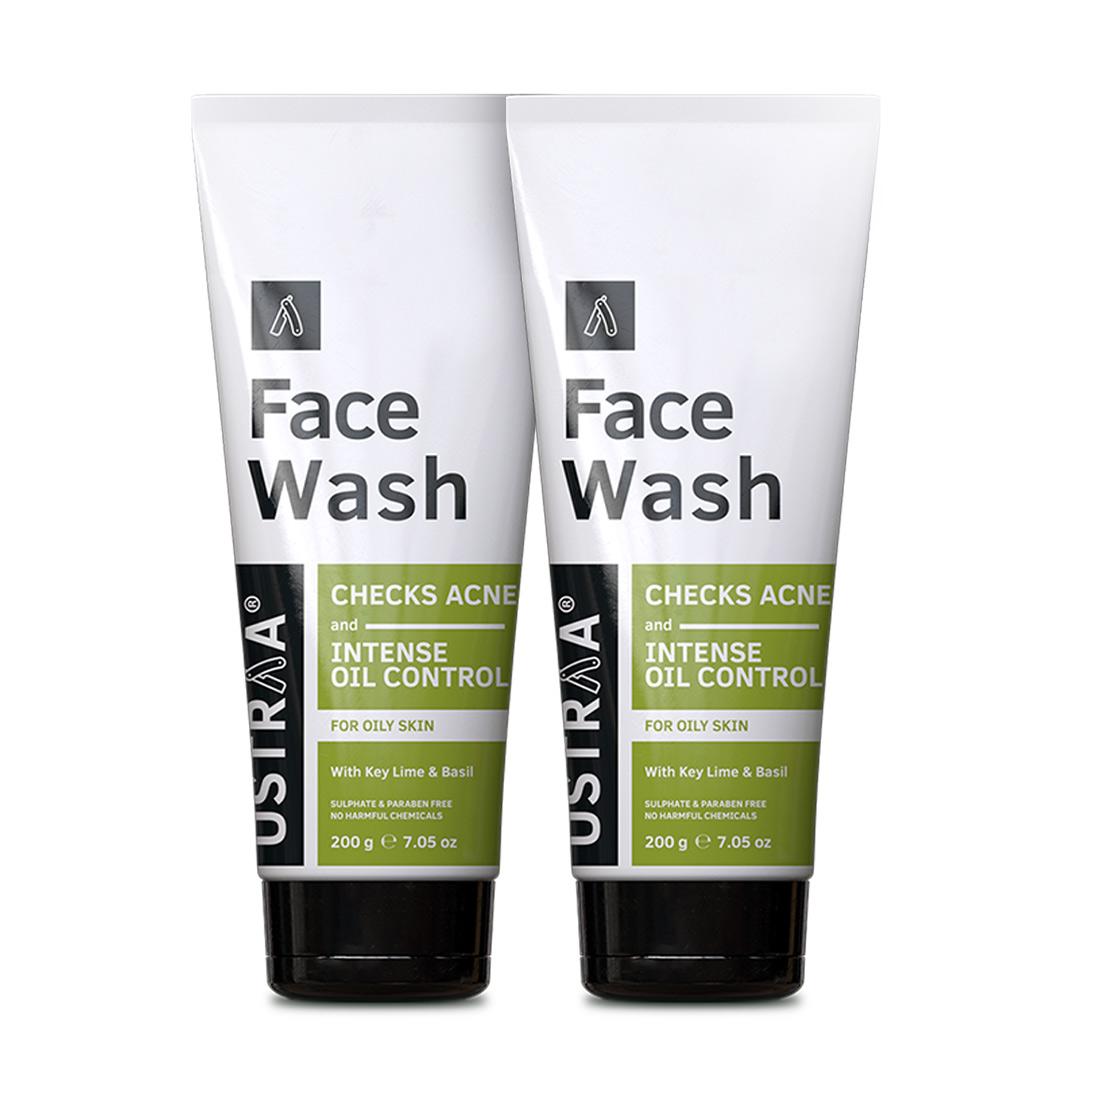 Ustraa | Ustraa Face Wash - Oily Skin (Checks Acne & Oil Control) - 200g Set of 2